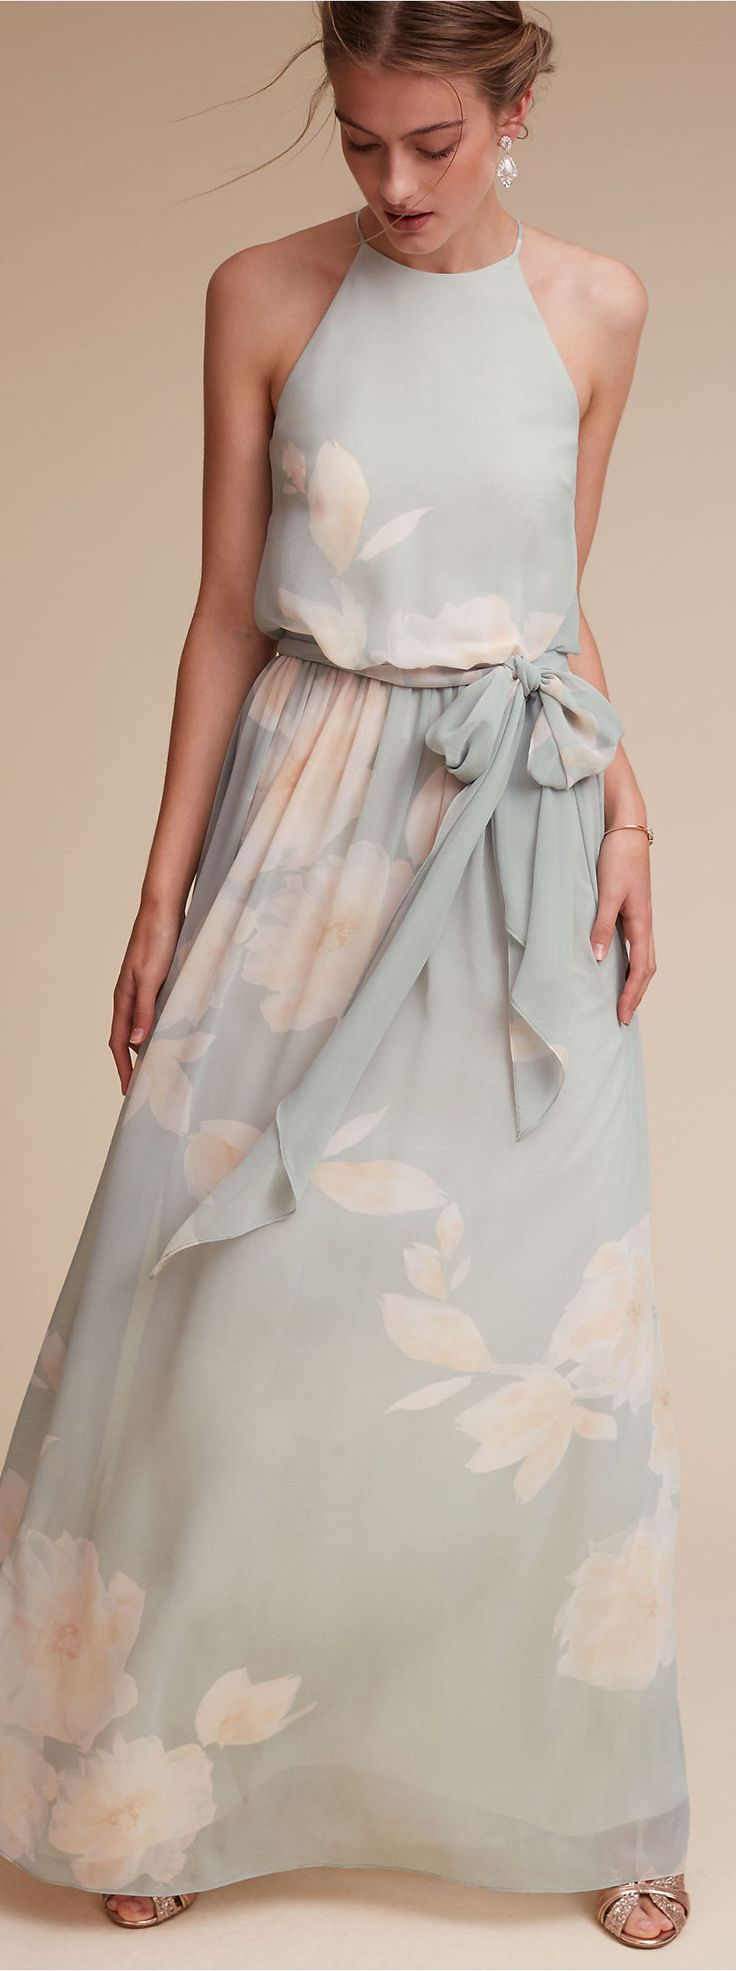 Wedding Floral Bridesmaid Dresses 17 best ideas about floral bridesmaid dresses on pinterest pastel dress bhldn